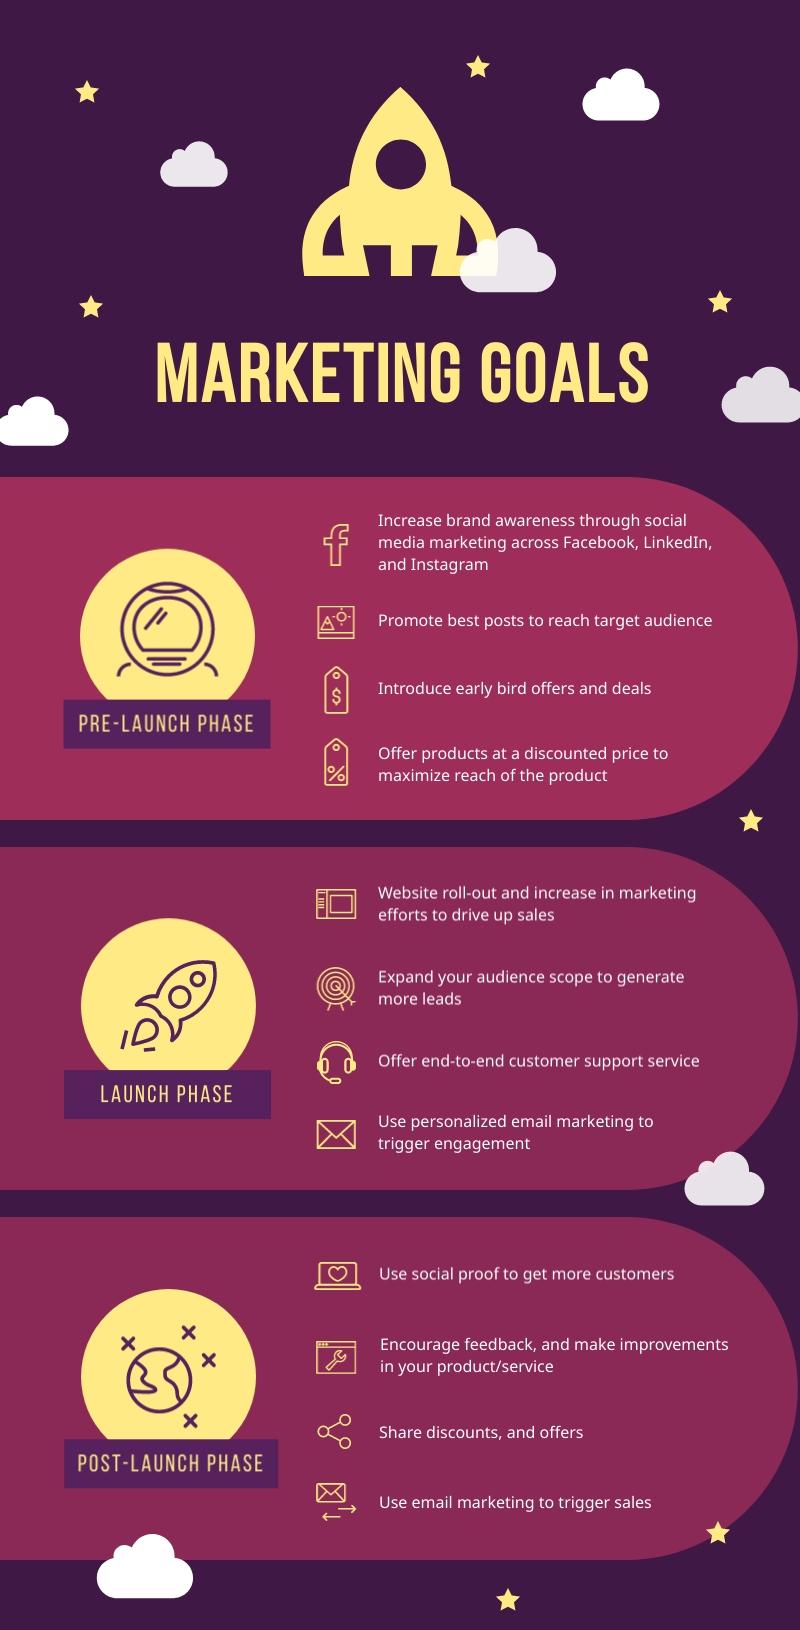 Marketing Goals - Infographic Template